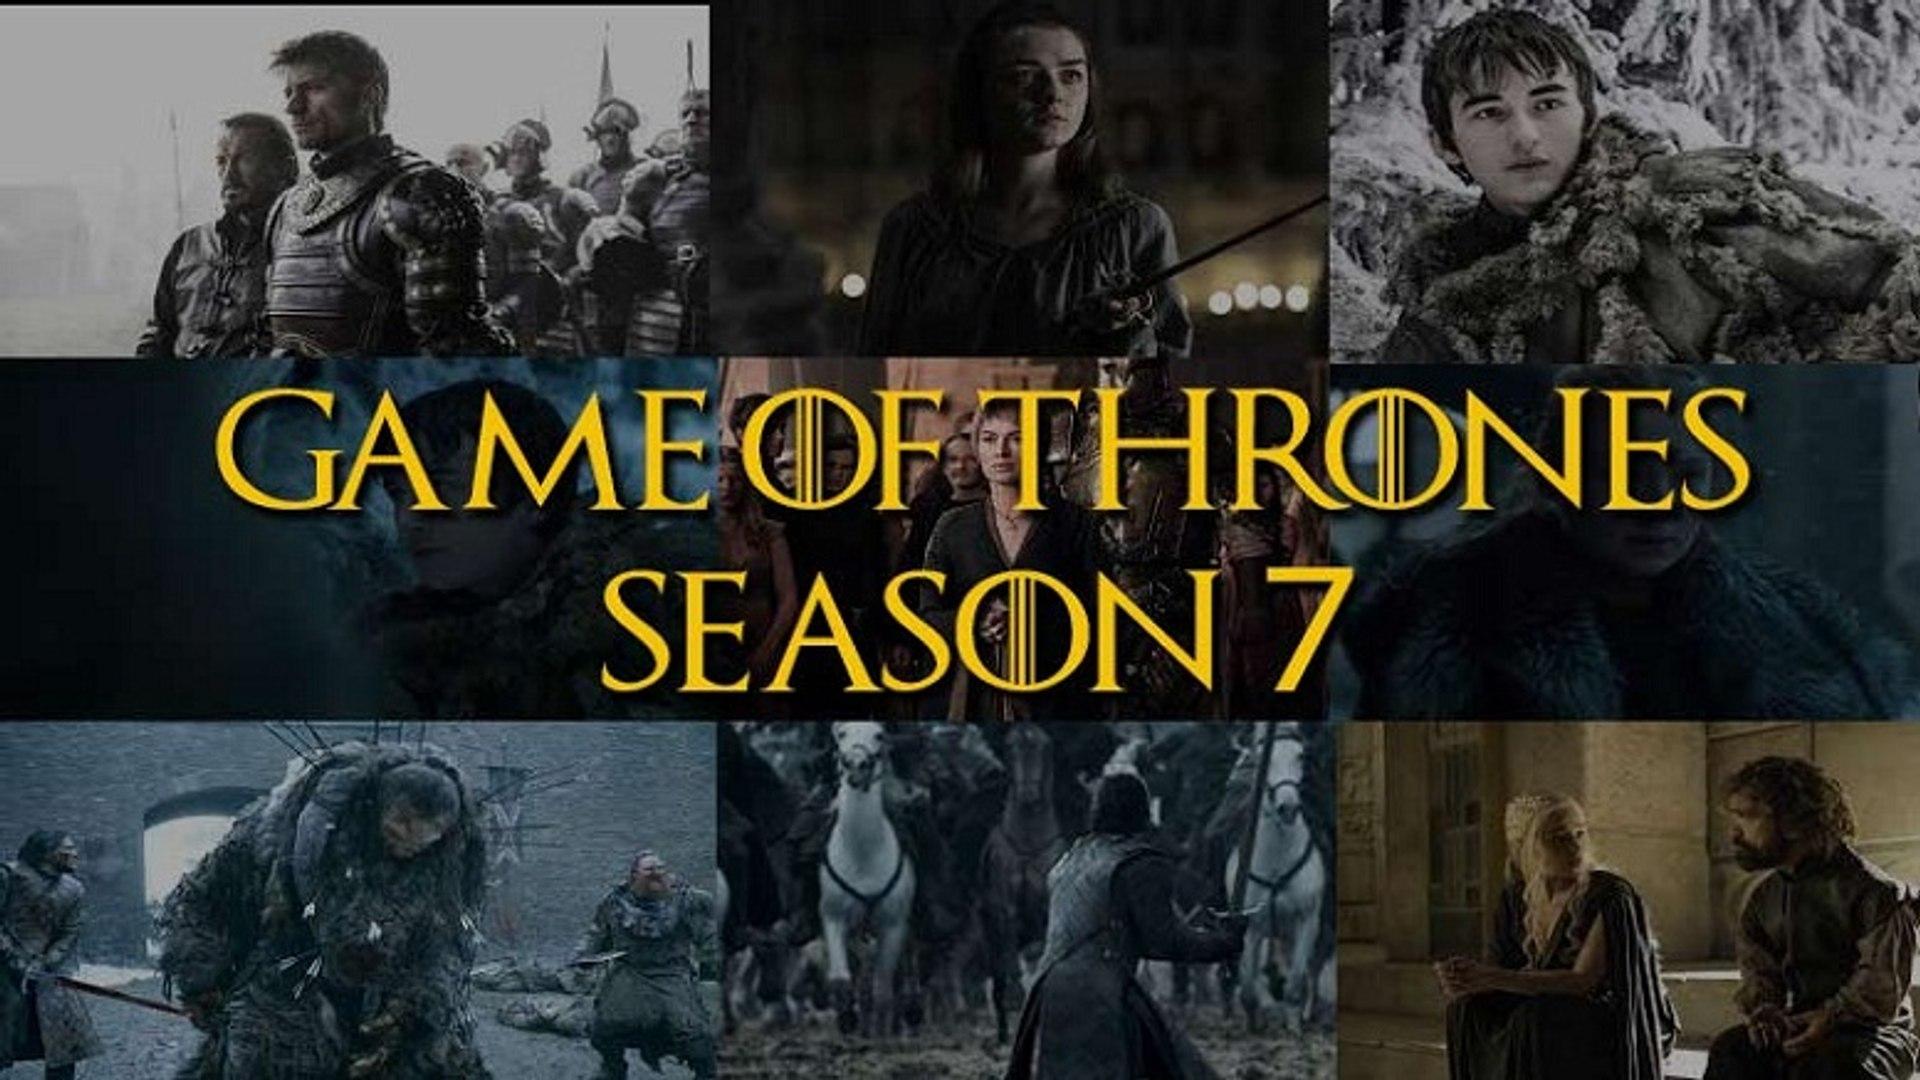 GOT [S07E07] Leaked Scenes !! Game Of Thrones 7x07 Season 7 Episode 7 Online